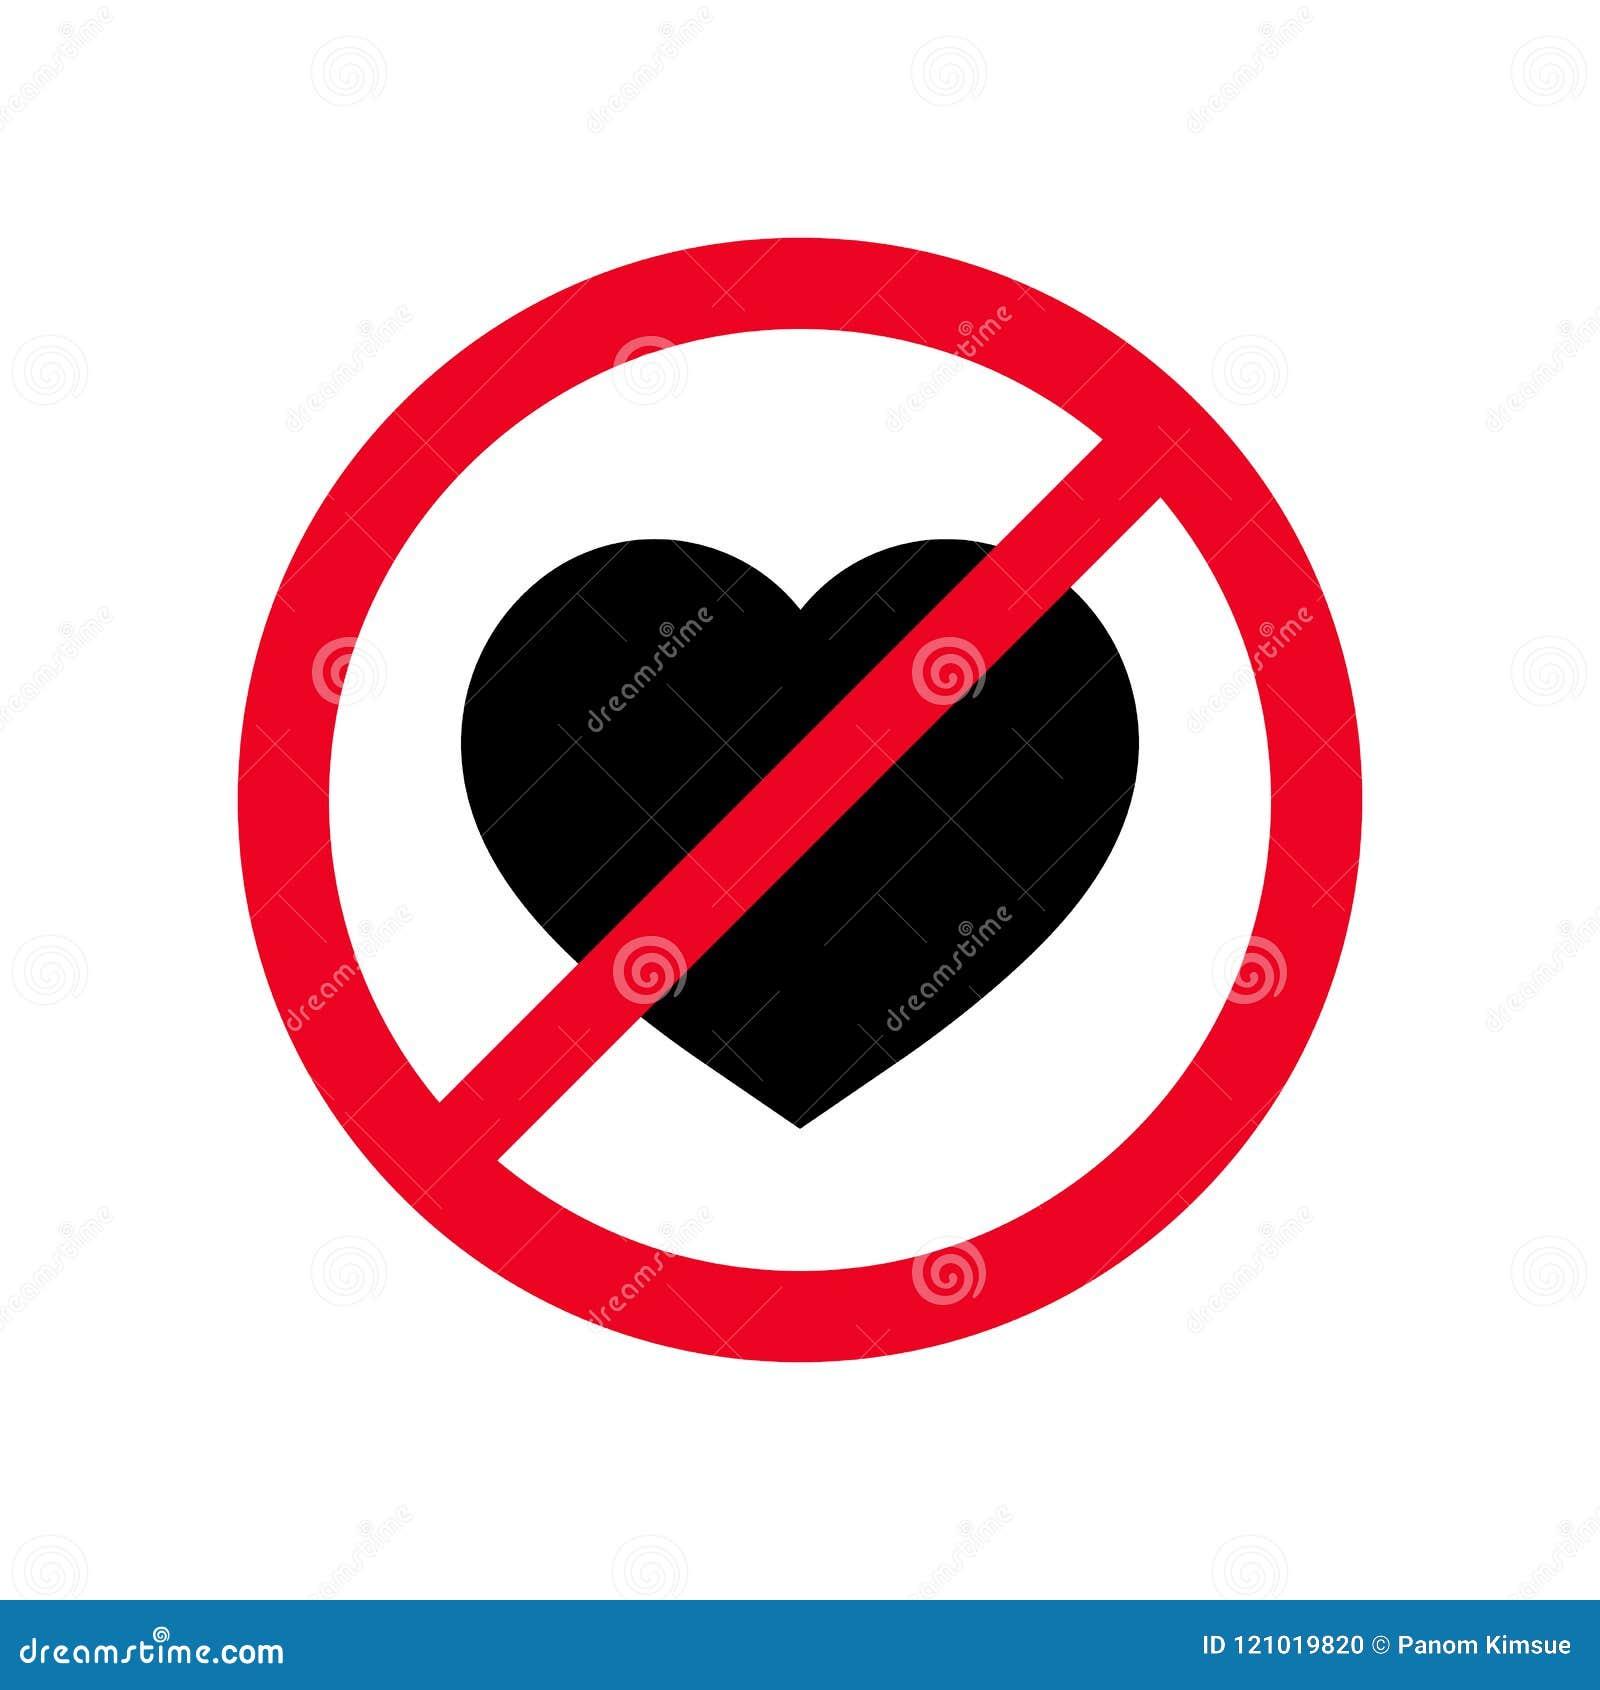 No Heart Flat Symbol Vector Icon Forbidden Sign Love Feelings